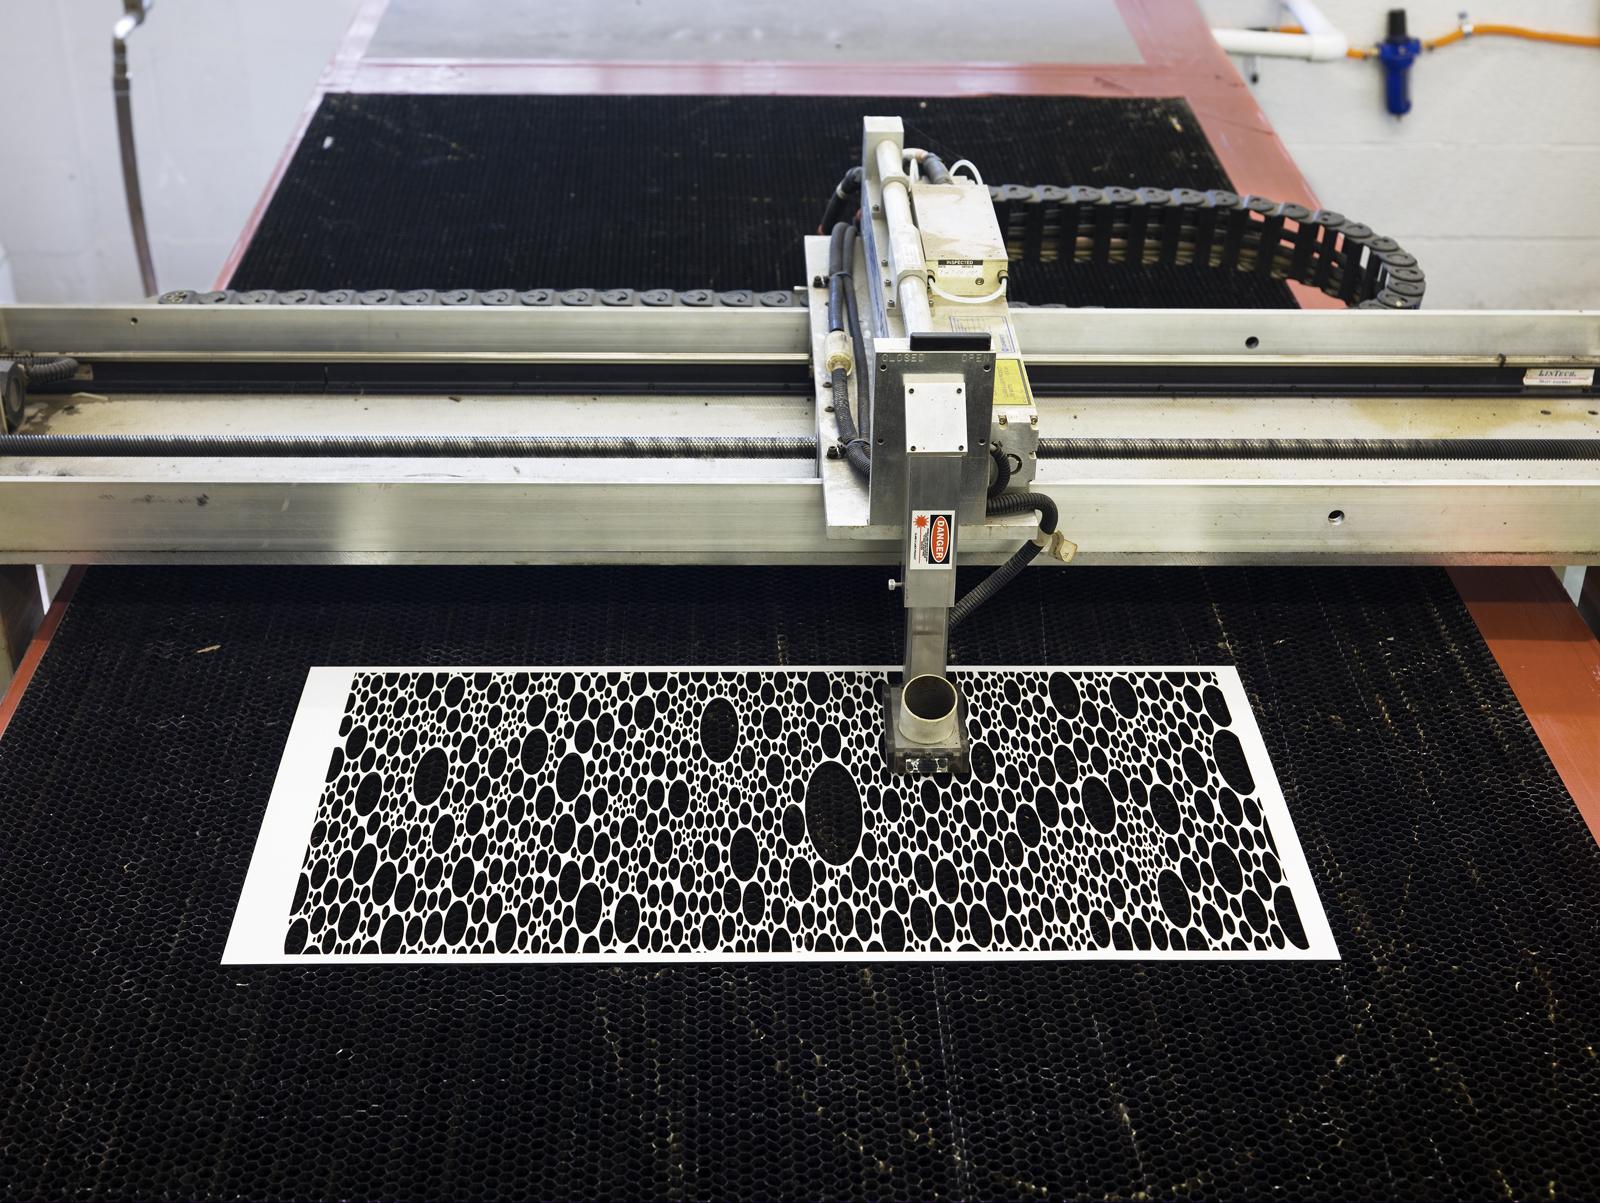 son of fruitbowl printing press